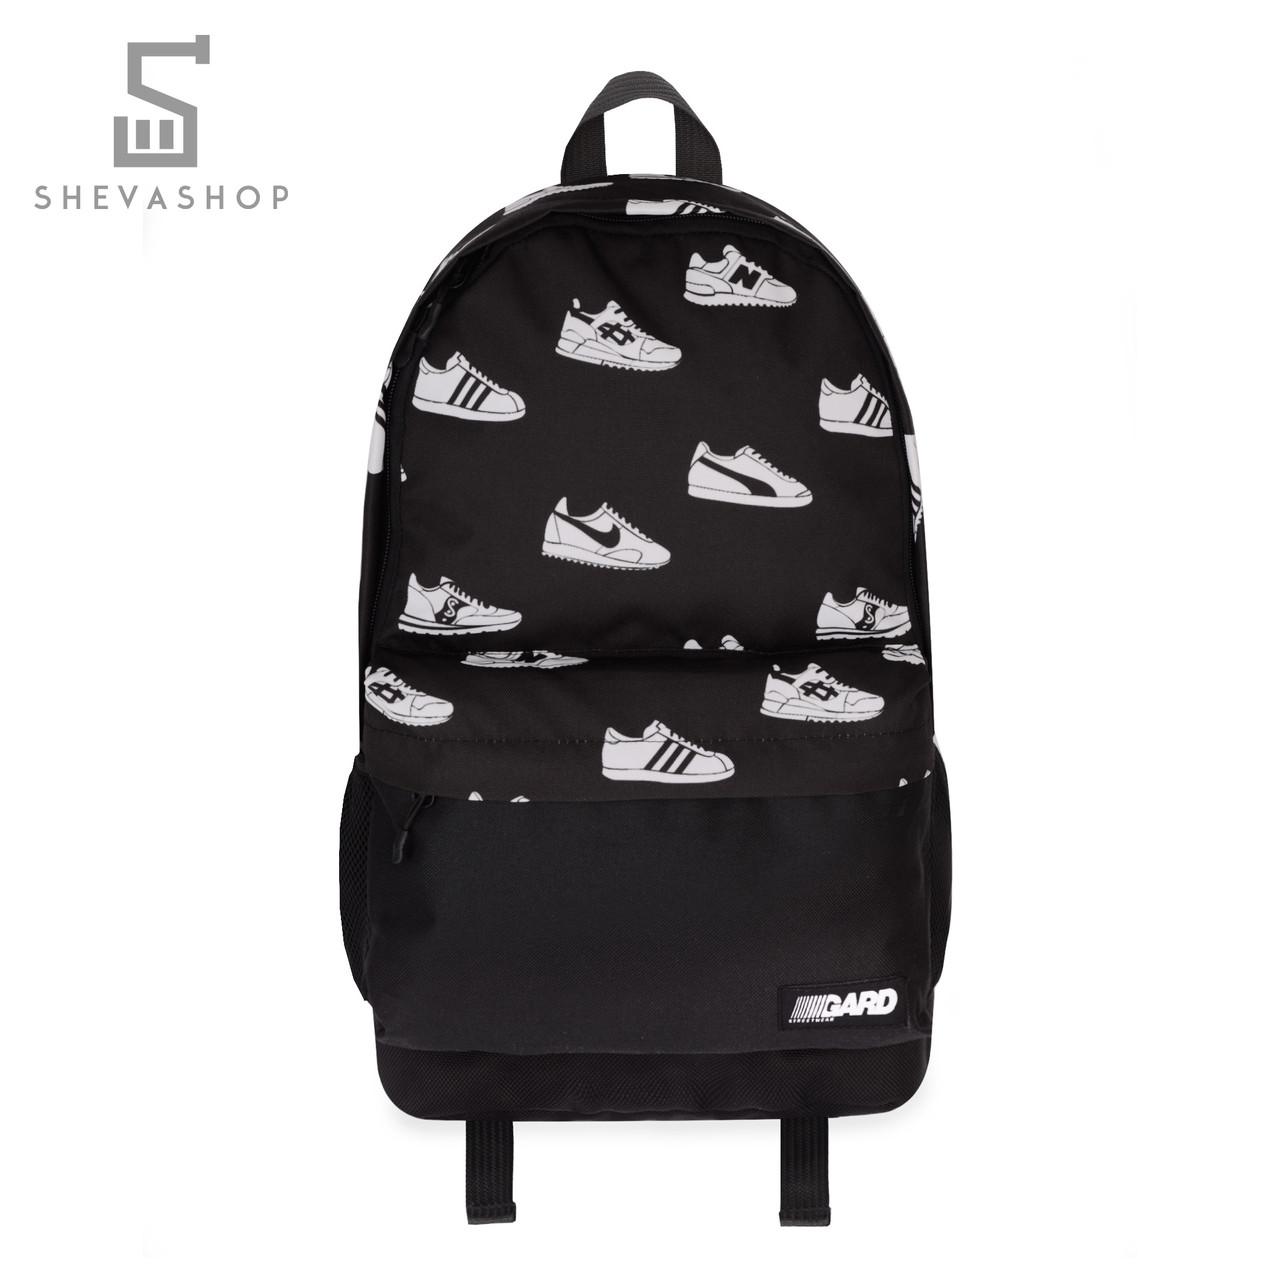 Рюкзак Gard City Sneaker 318